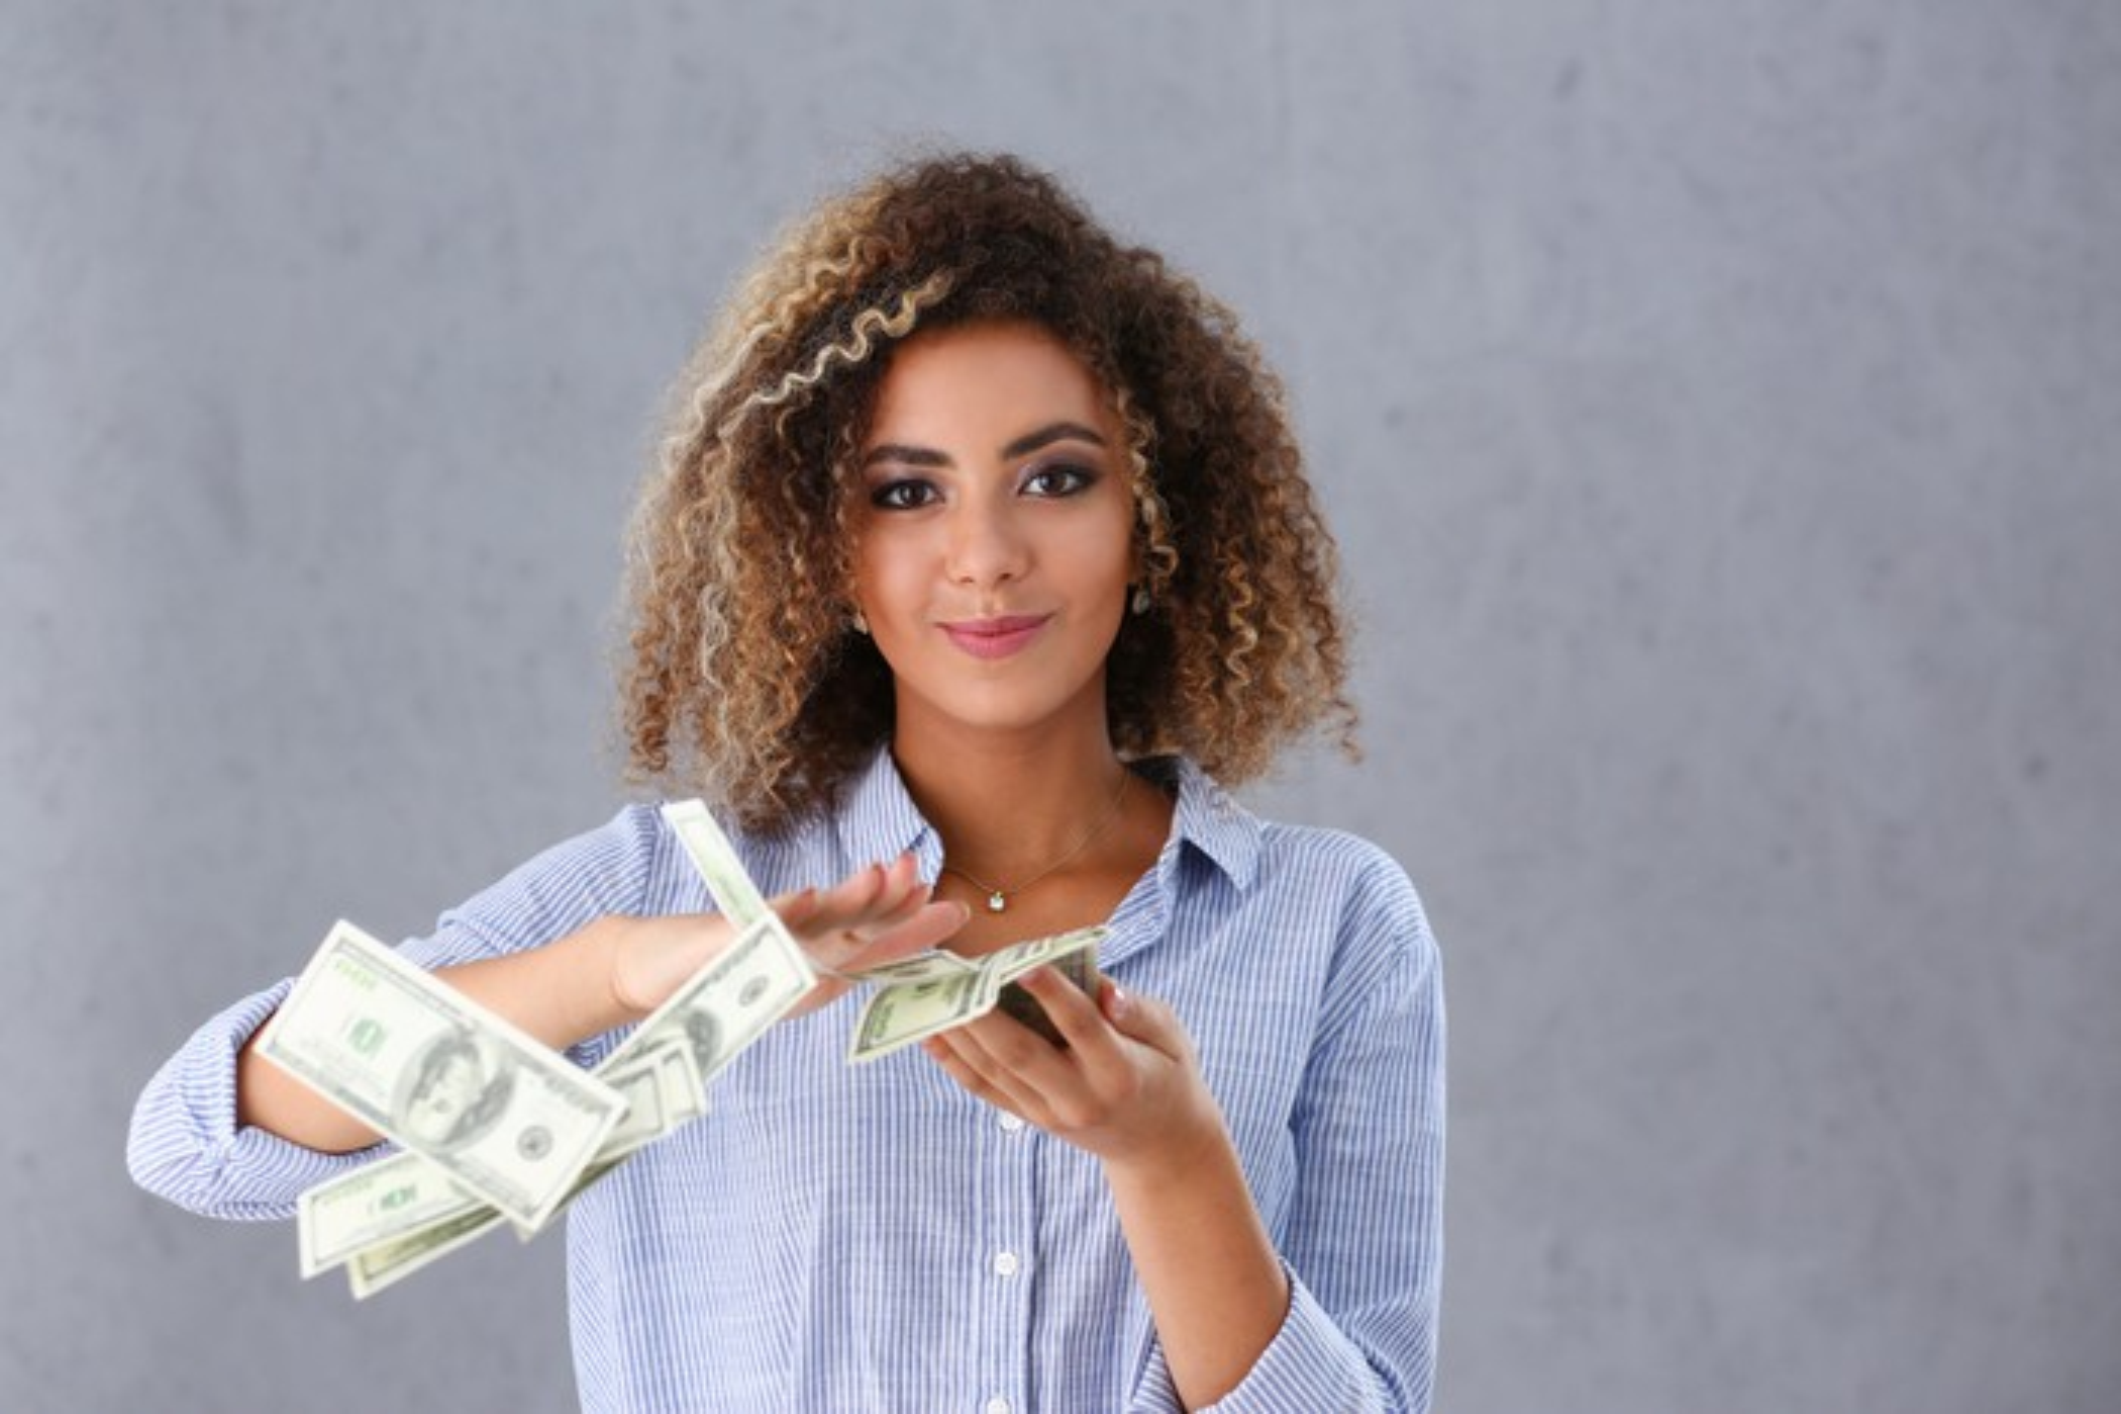 young woman making it rain money